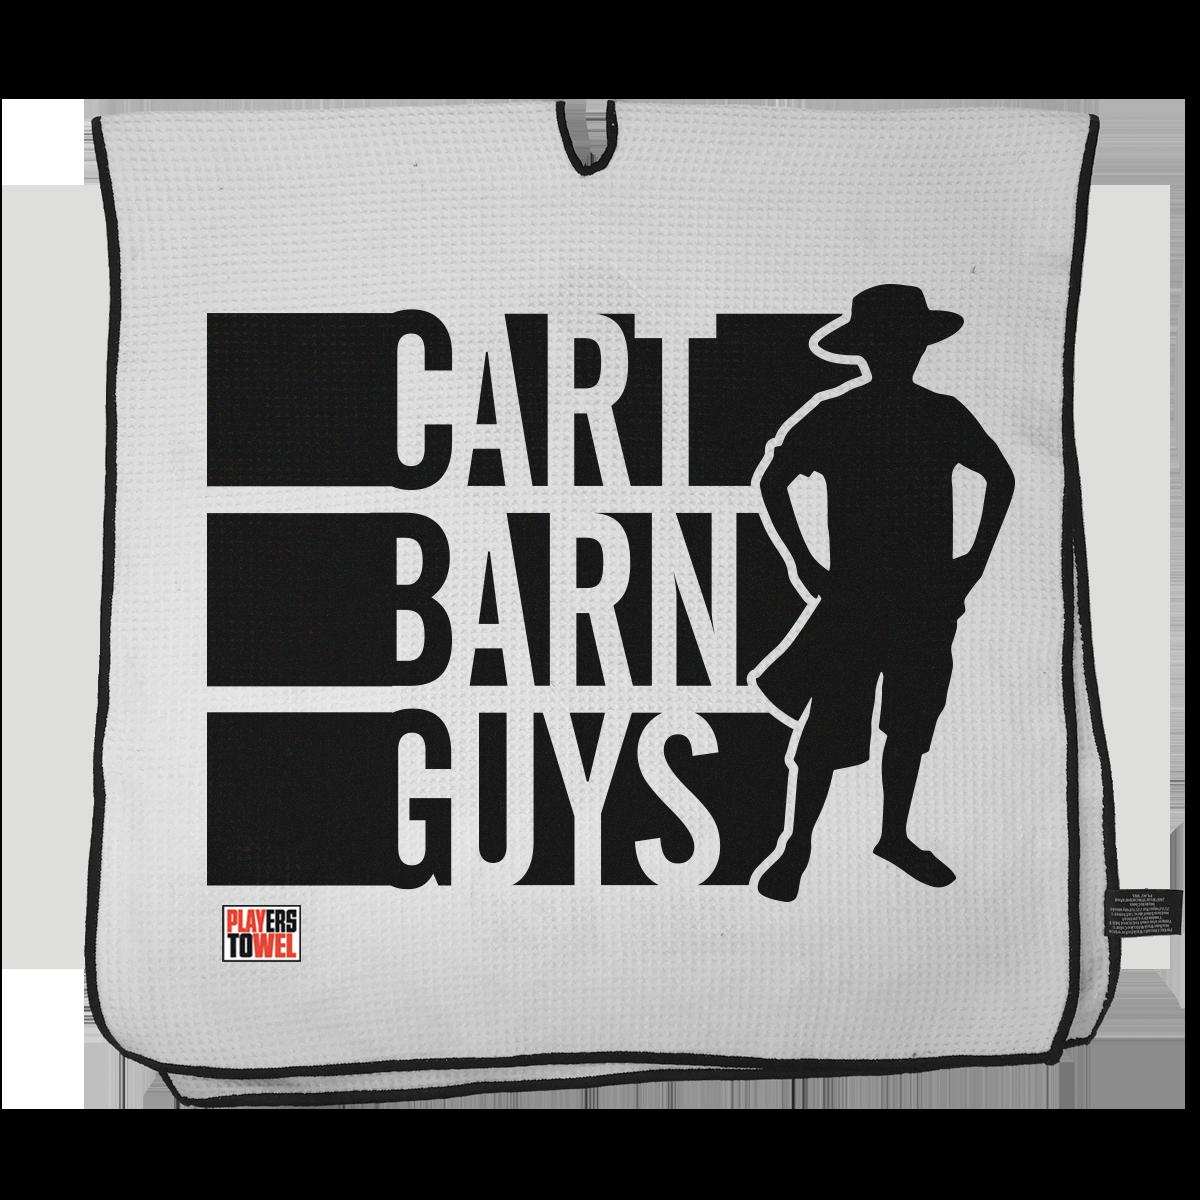 Cart Barn Guy Player Towel